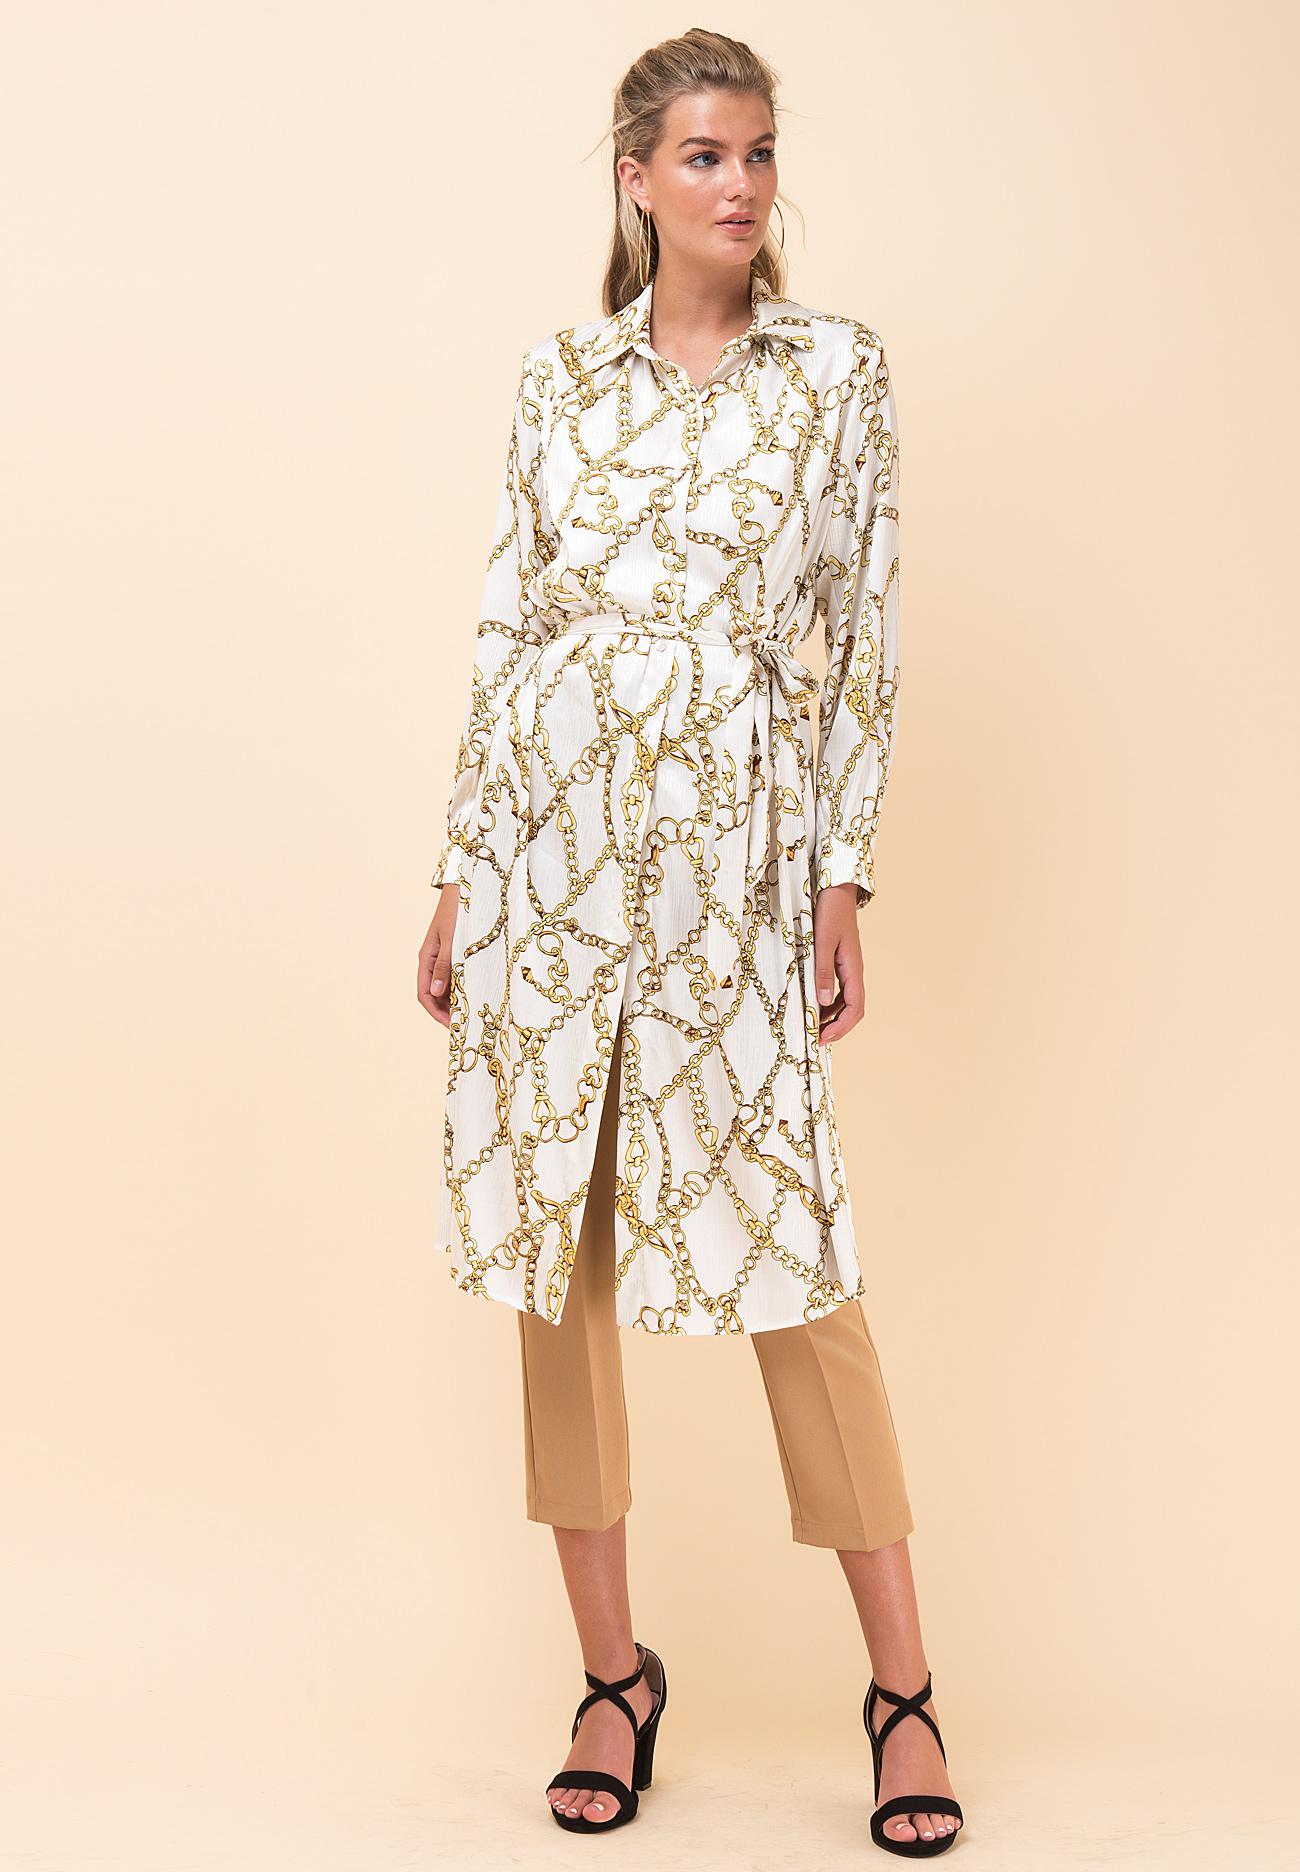 11478e341d4 Φόρεμα με τύπωμα αλυσίδες σε στιλ πουκάμισο - ZIC ZAC